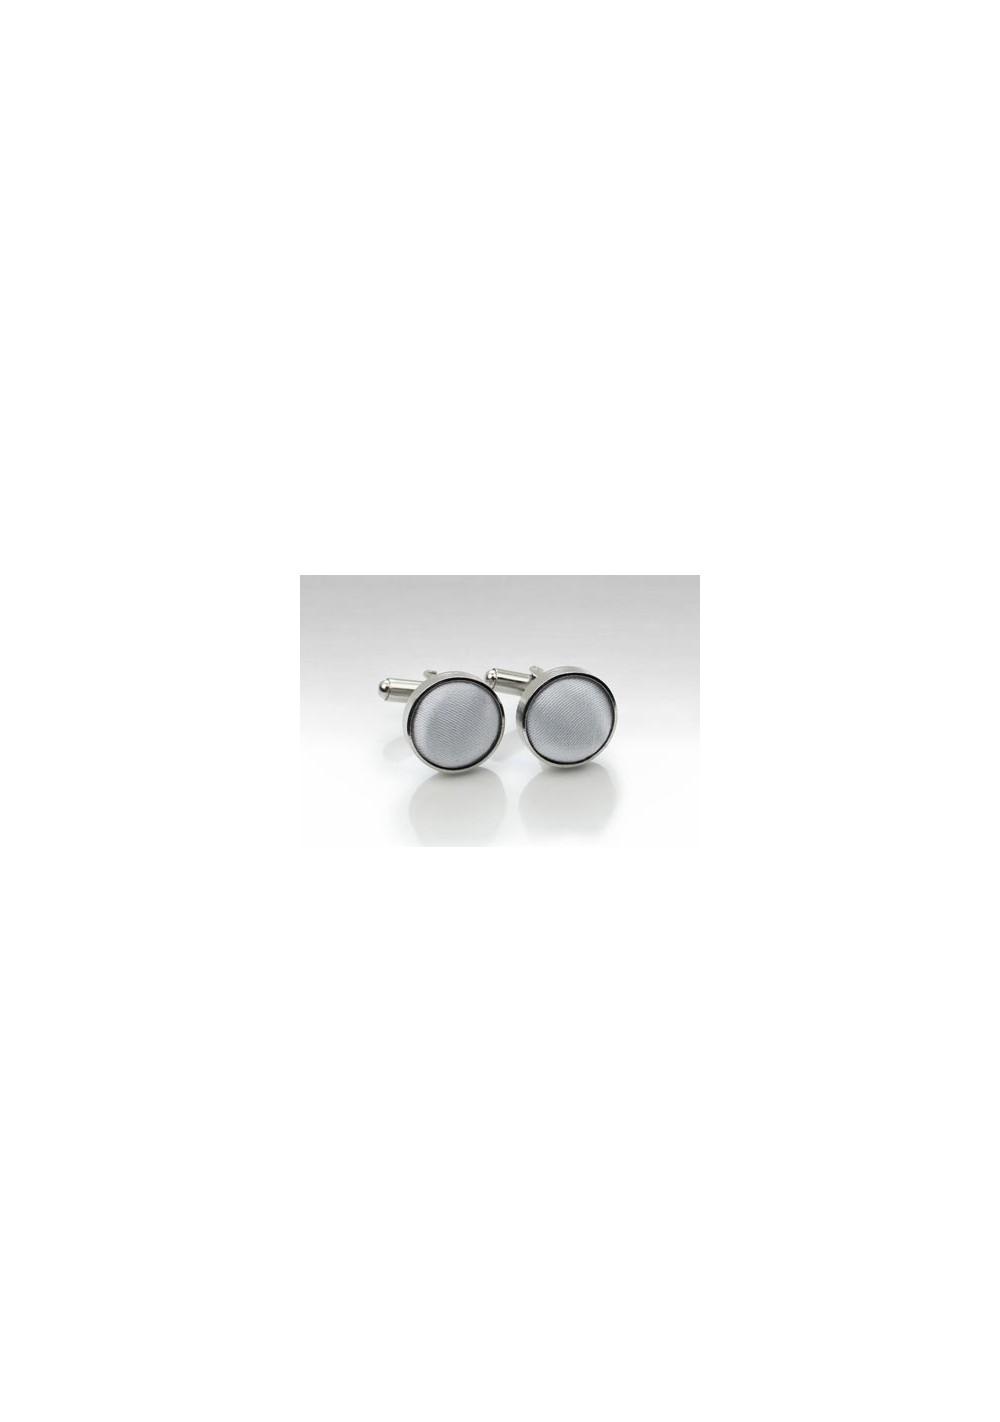 Silver Fabric Cufflinks